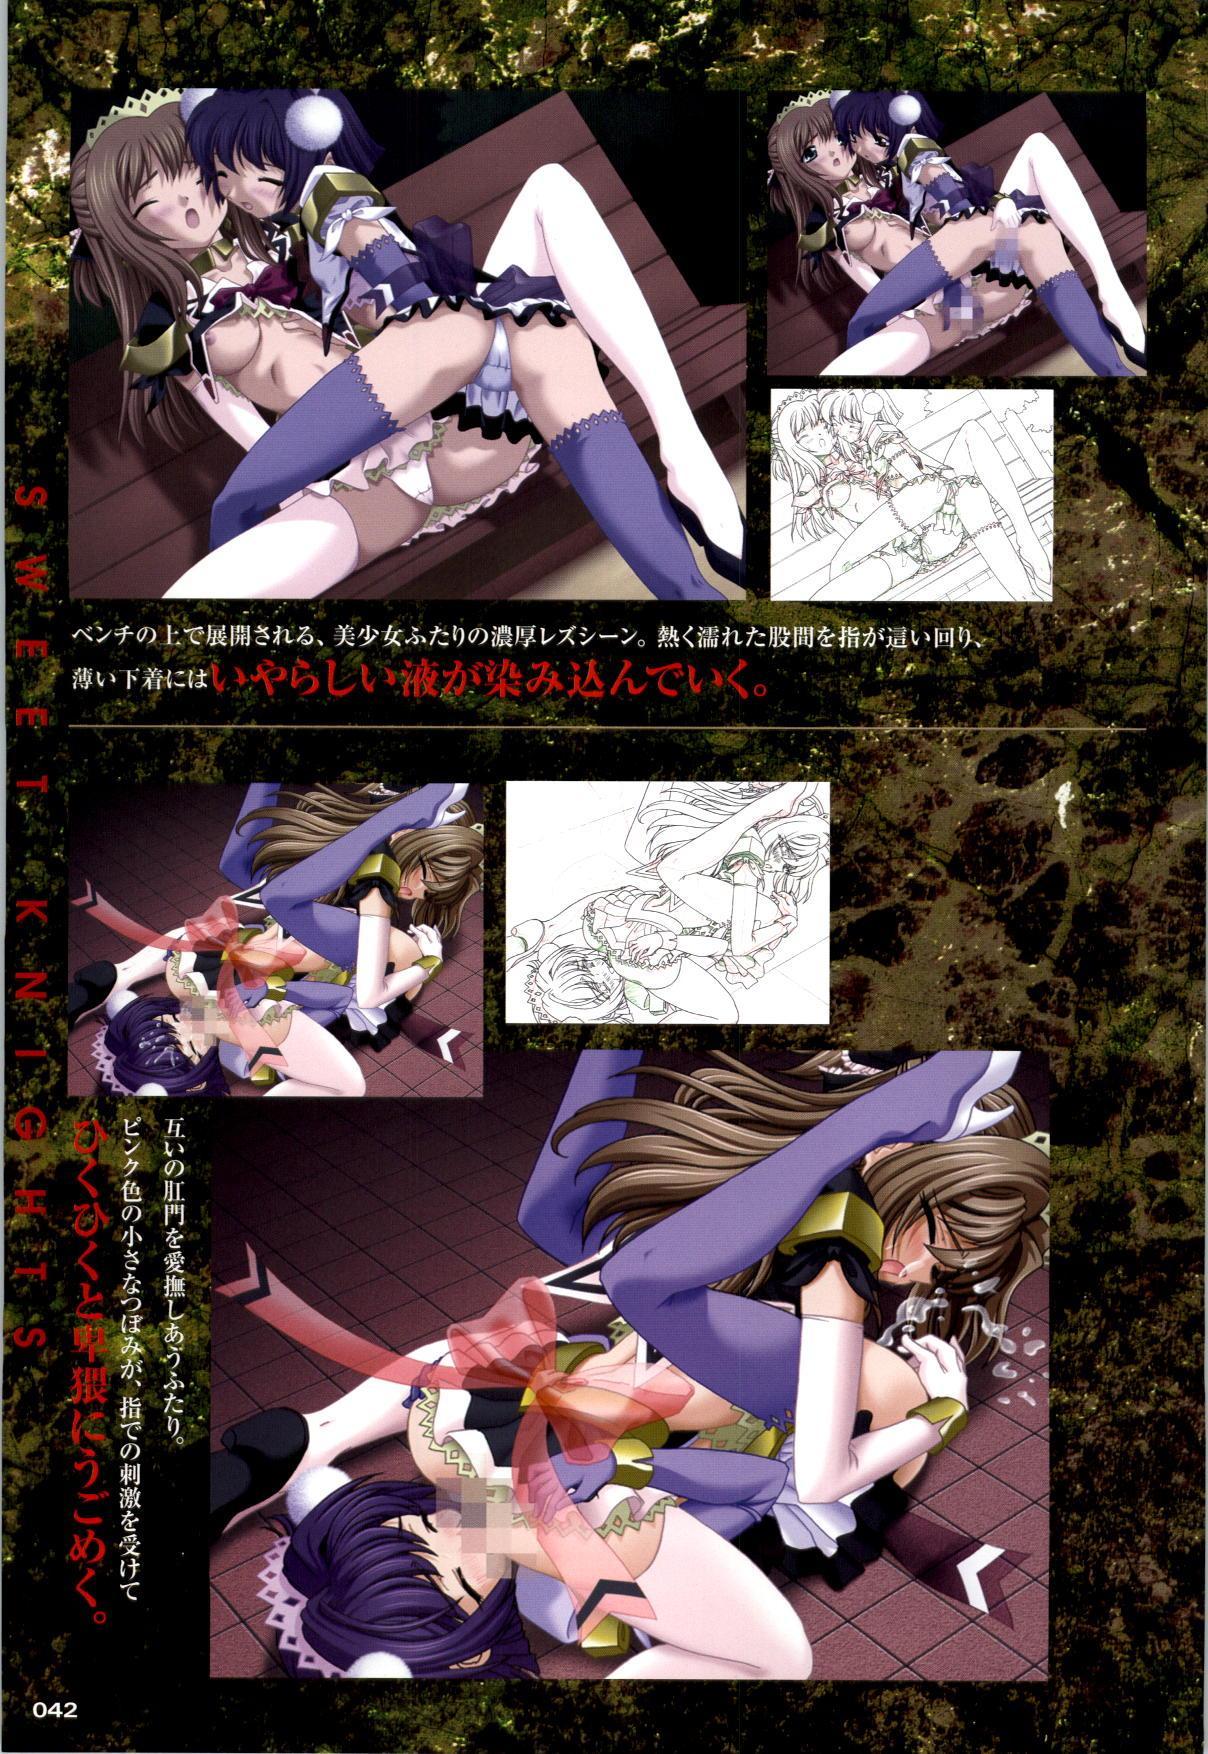 Mahou Senshi Sweet Knight & Mahou Senshi Princess Tear 41